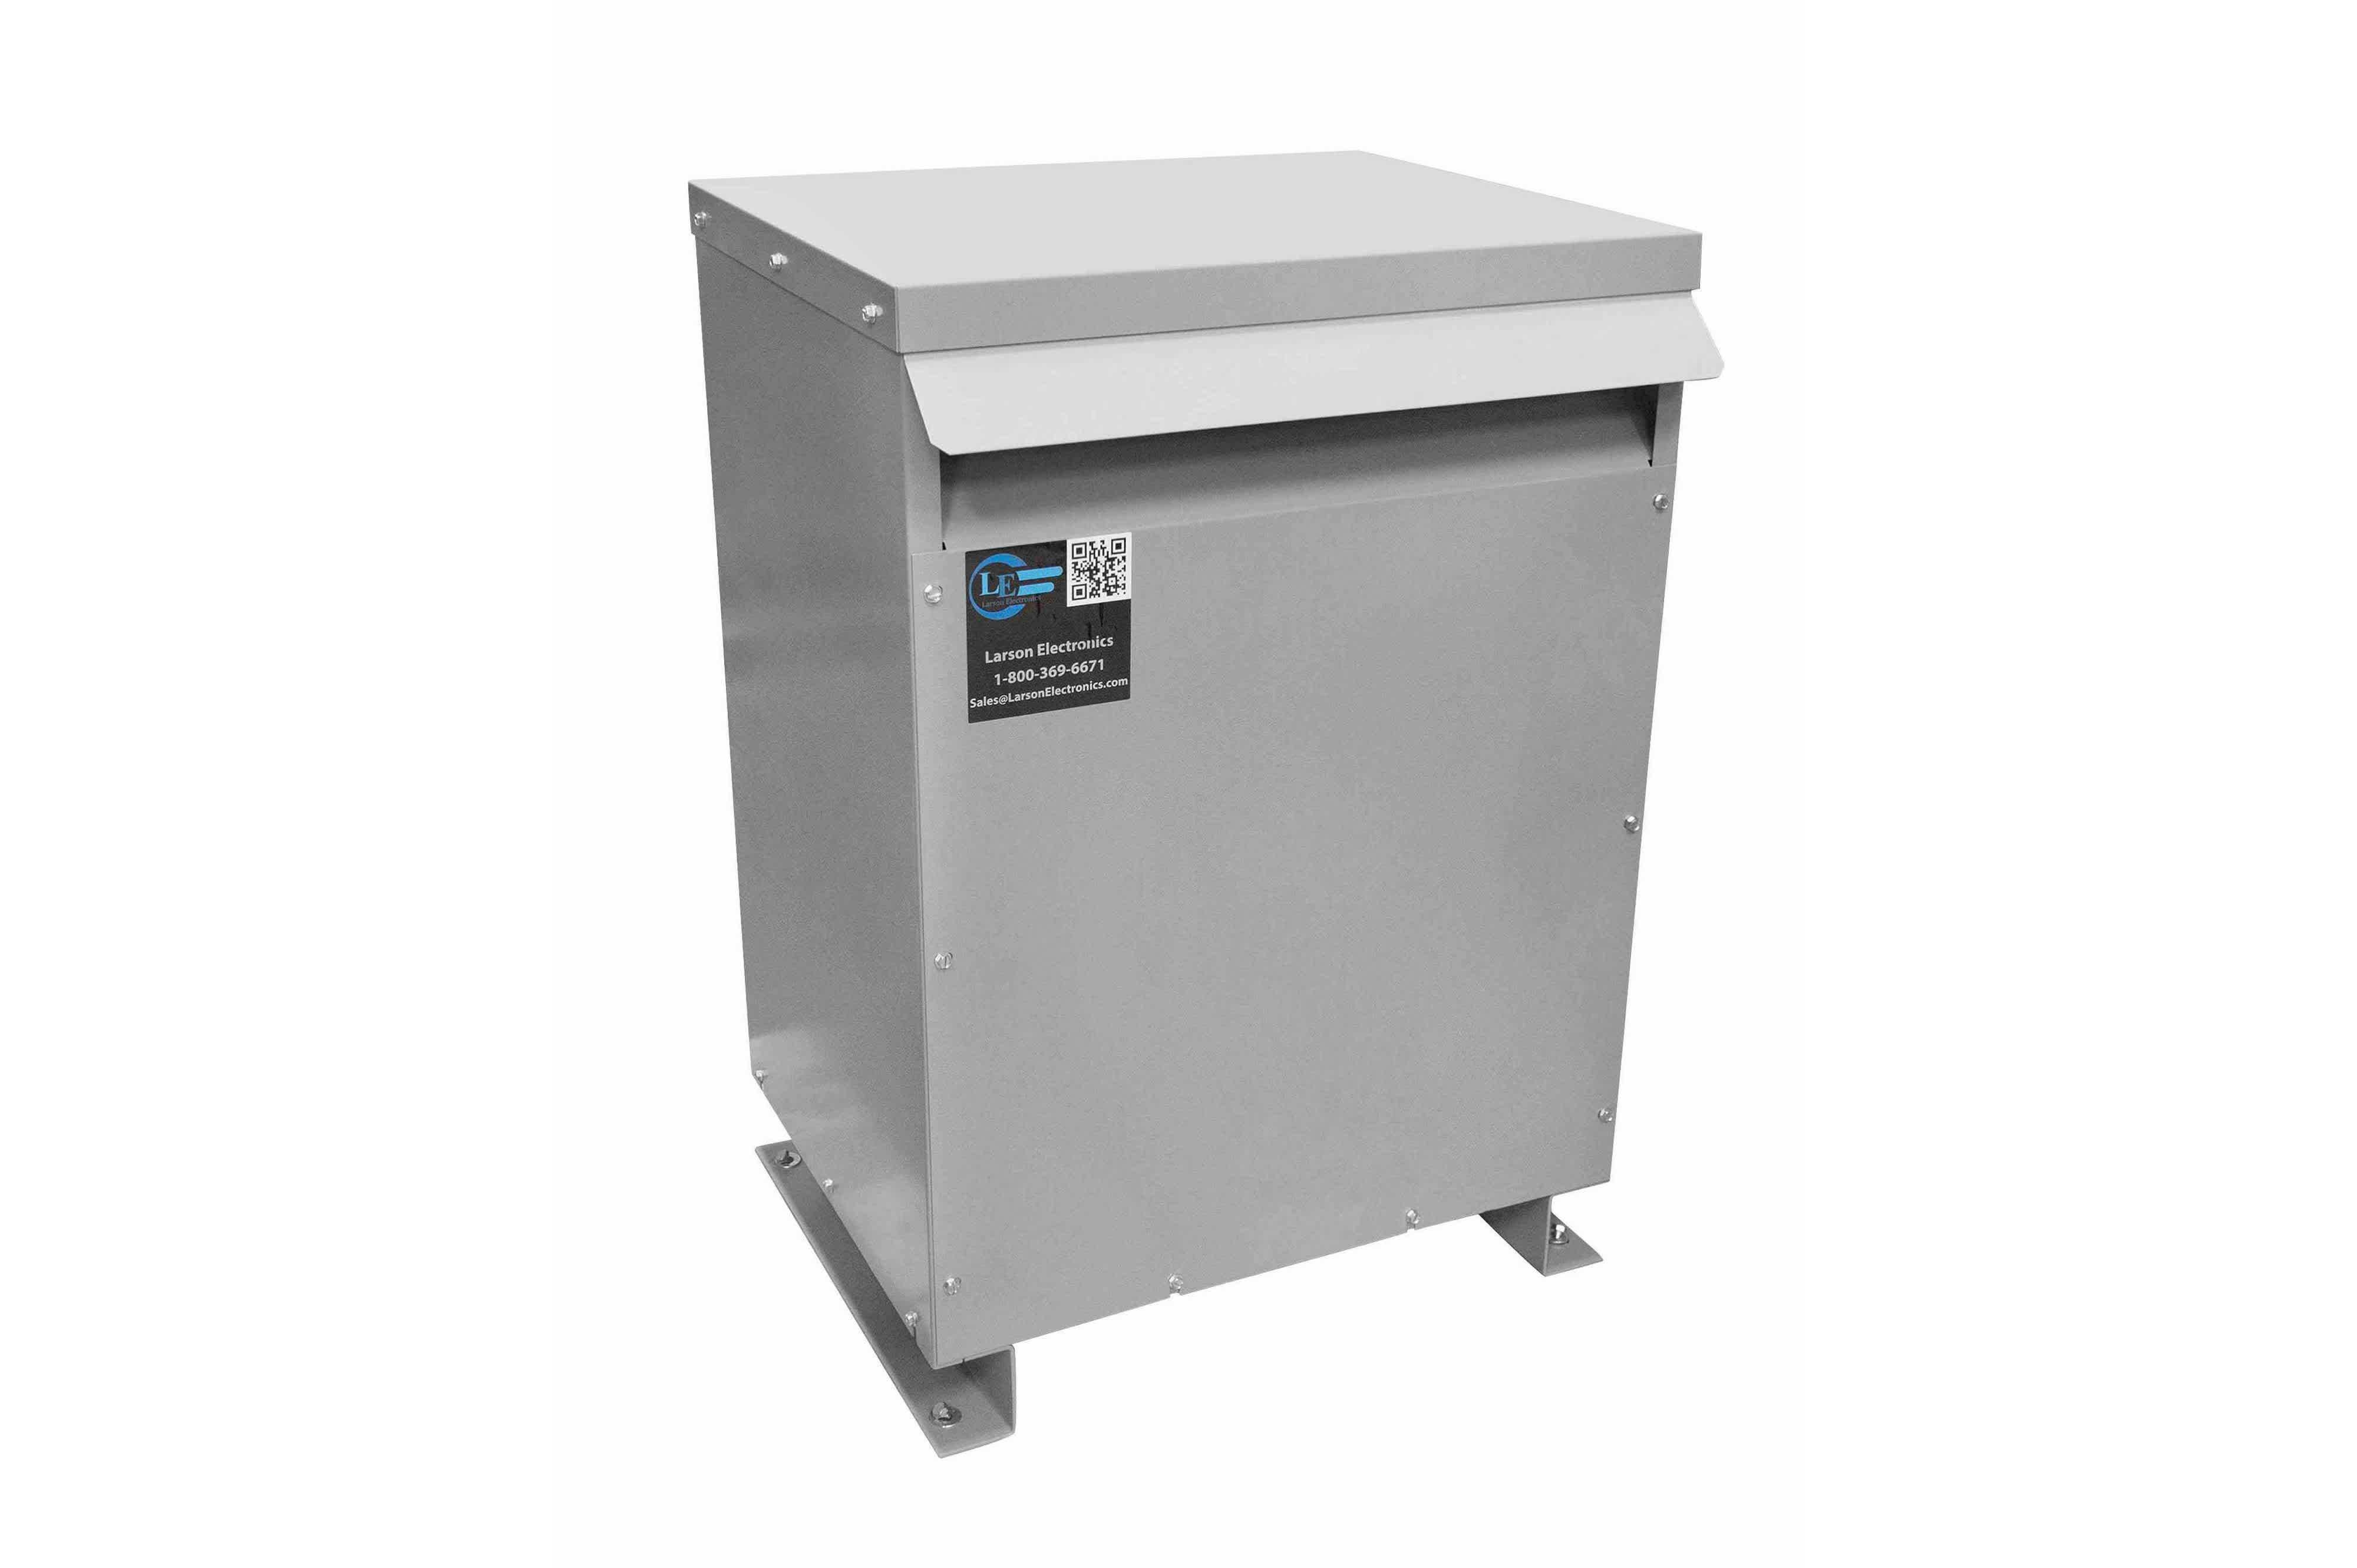 37.5 kVA 3PH Isolation Transformer, 440V Wye Primary, 208V Delta Secondary, N3R, Ventilated, 60 Hz